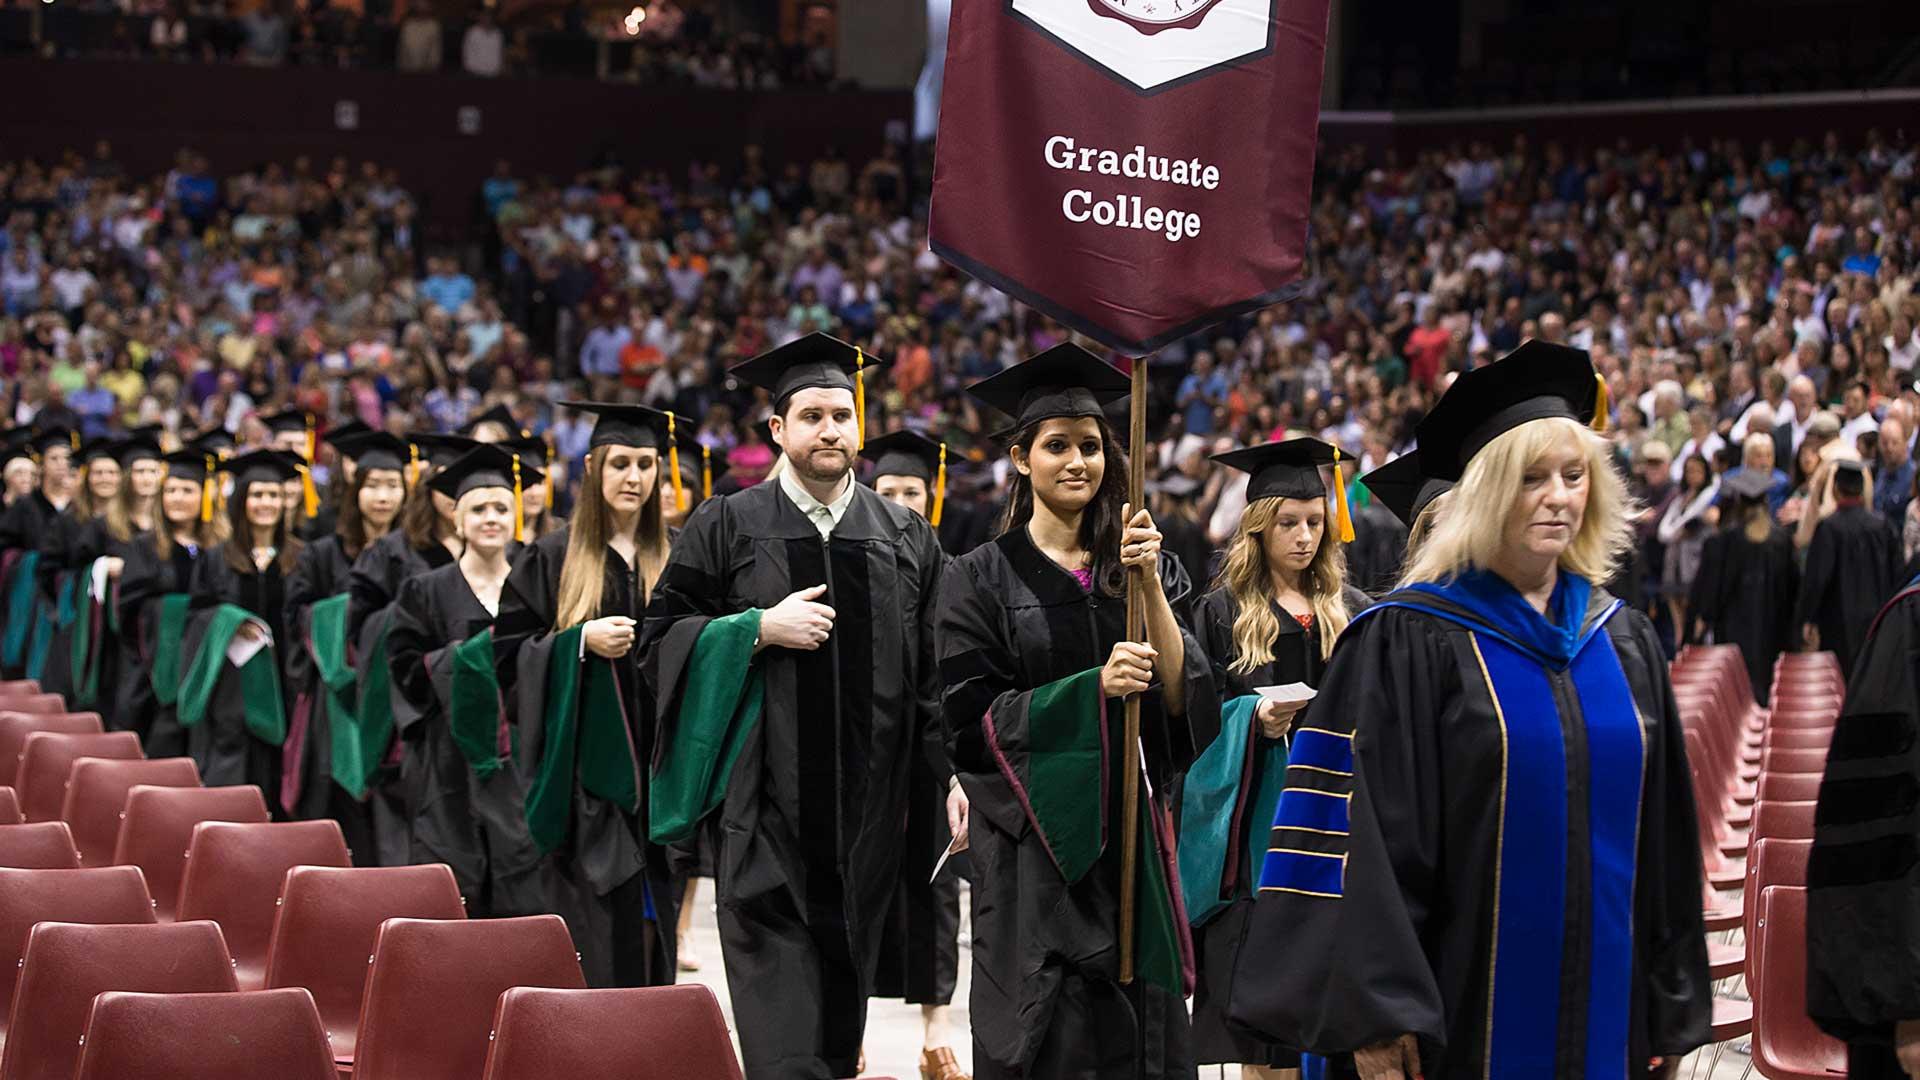 Graduate College - Missouri State University